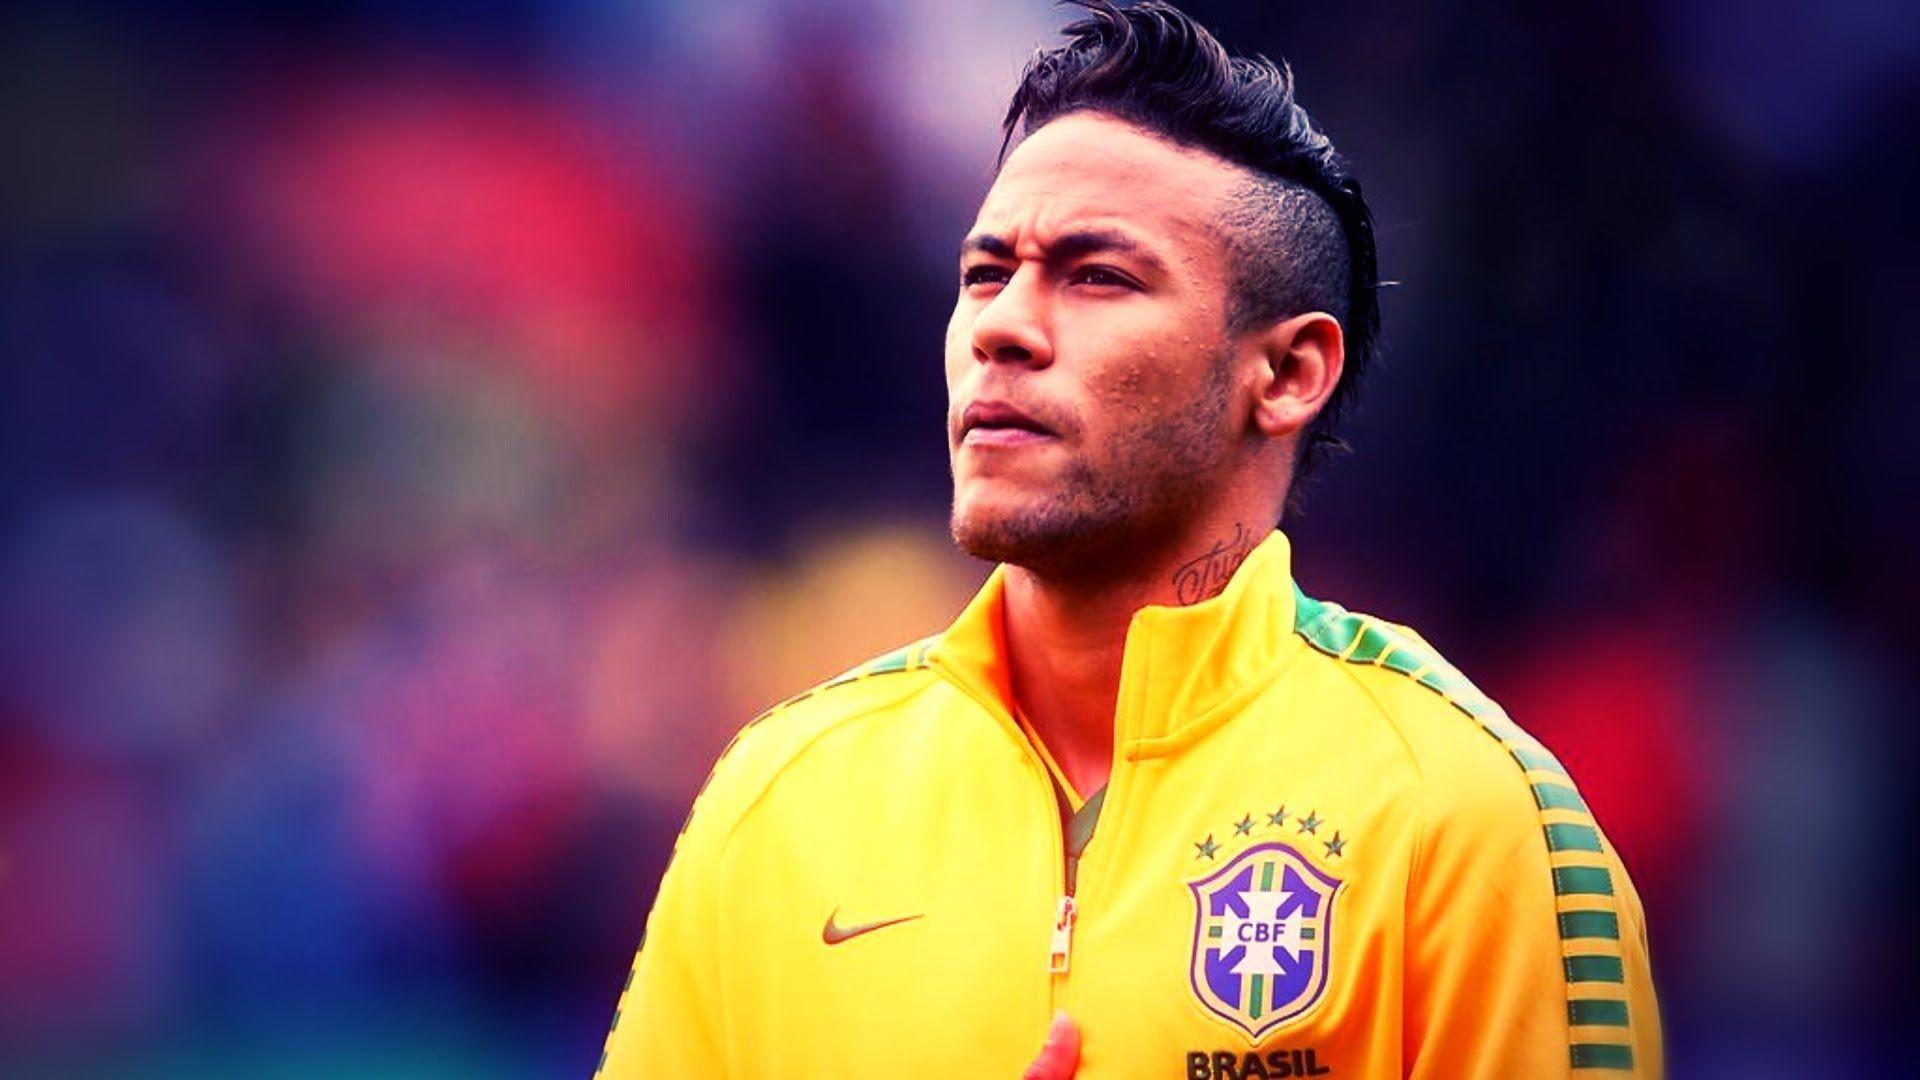 Neymar Wallpaper Brazil 2018 Neymar Jr Images